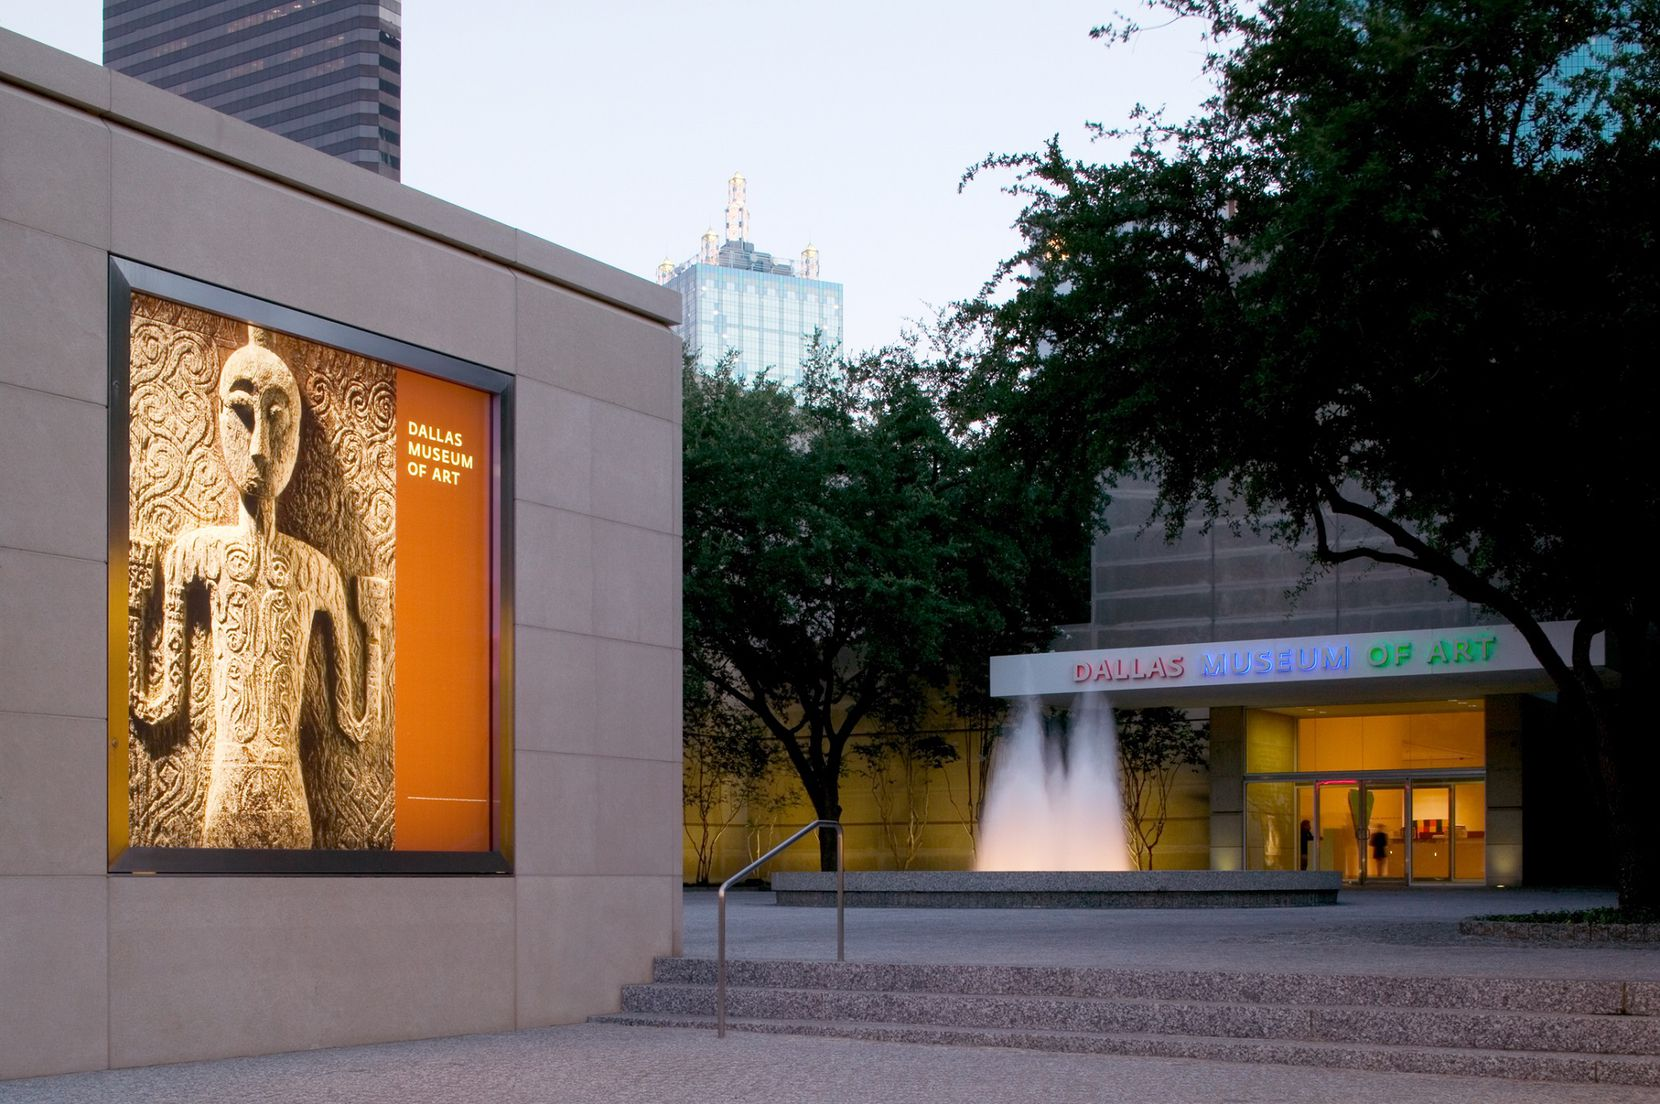 Dallas Museum of Art exterior. Photo courtesy of Dallas Museum of Art.